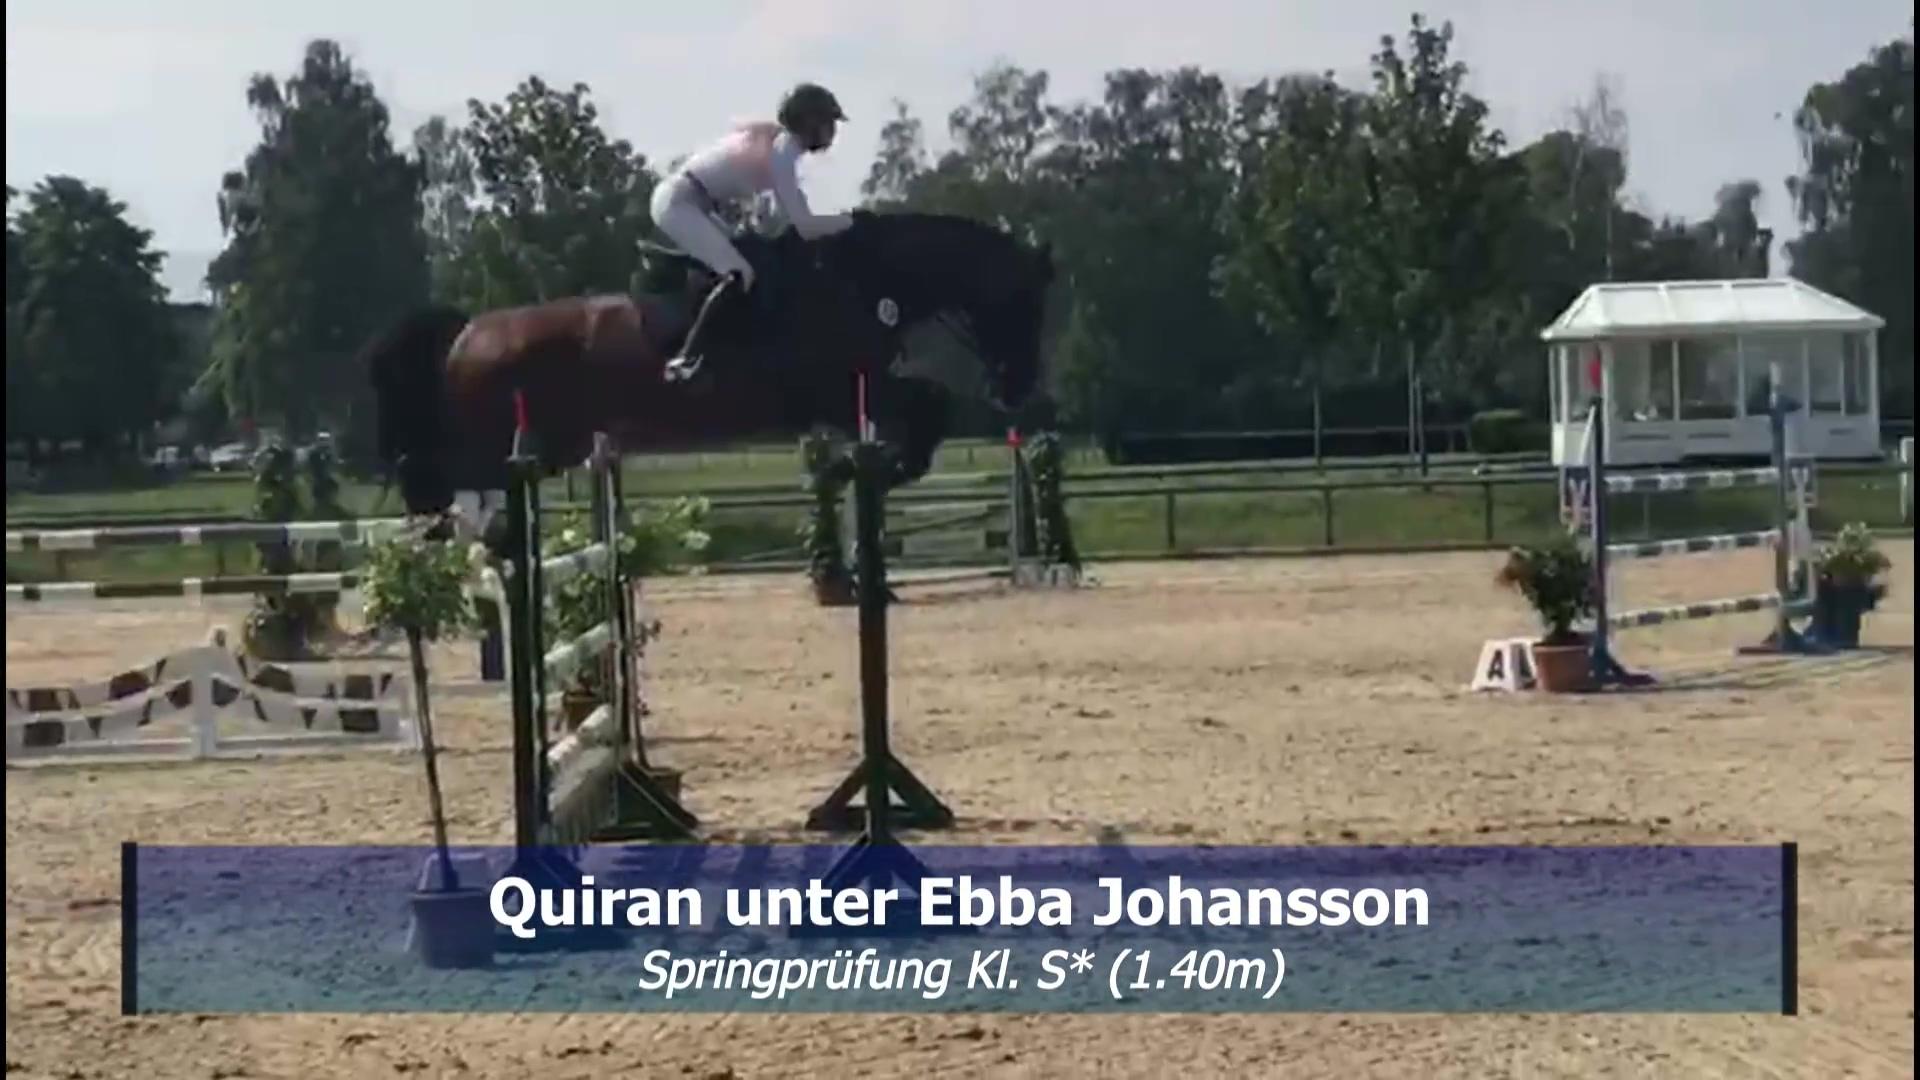 Quiran_Segeberg